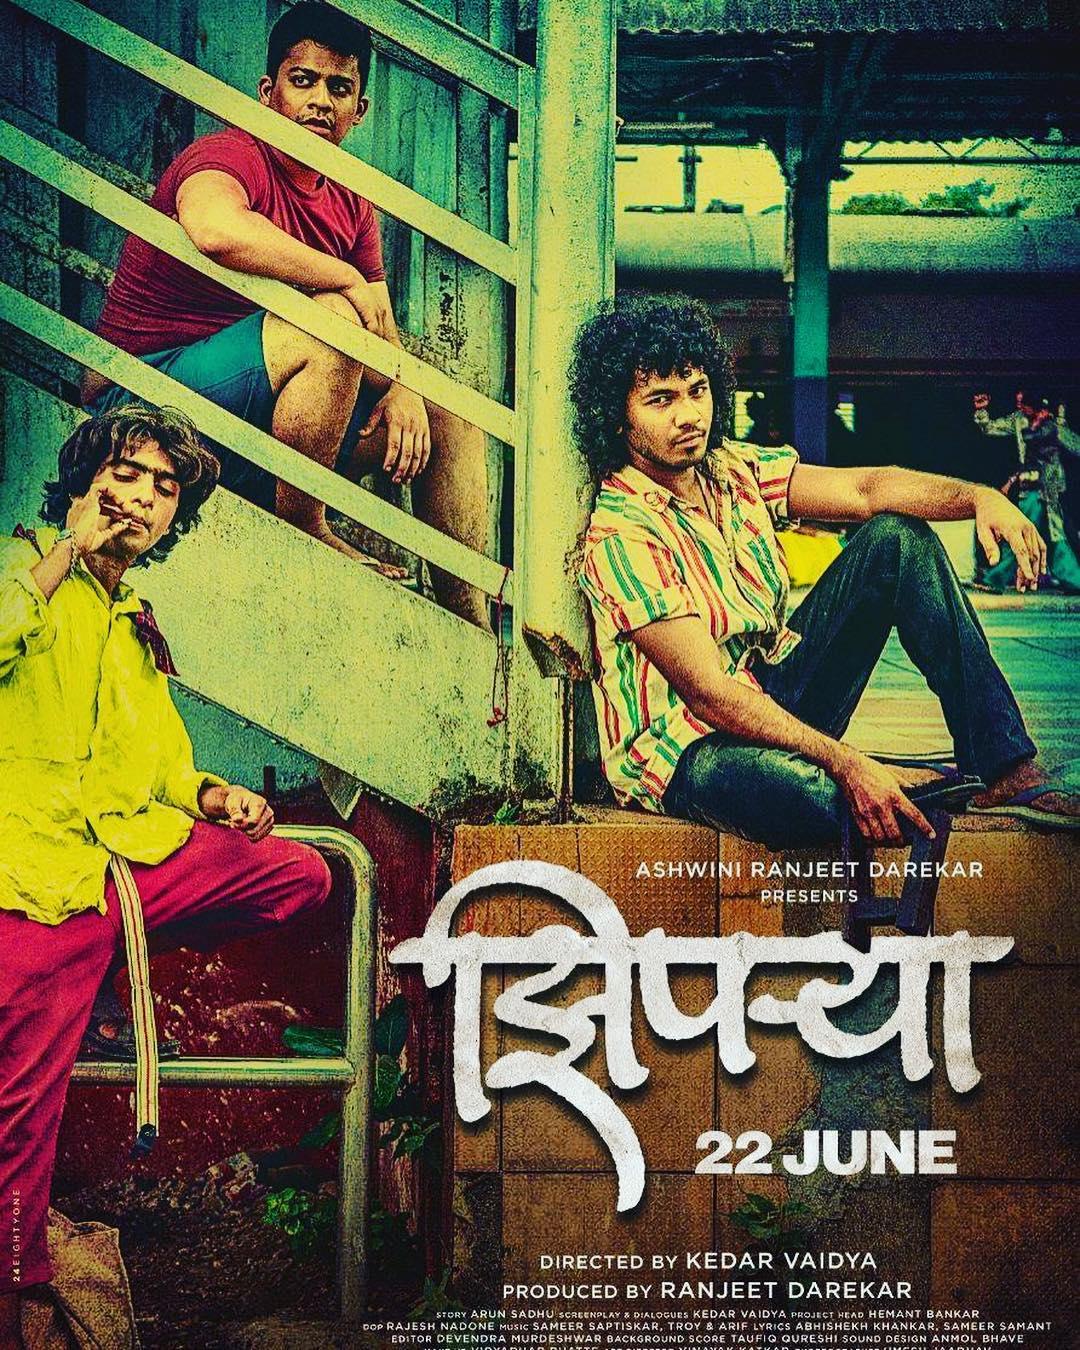 Ziprya (2018) - Marathi Movie Cast Story Release Date Wiki Actress Actor